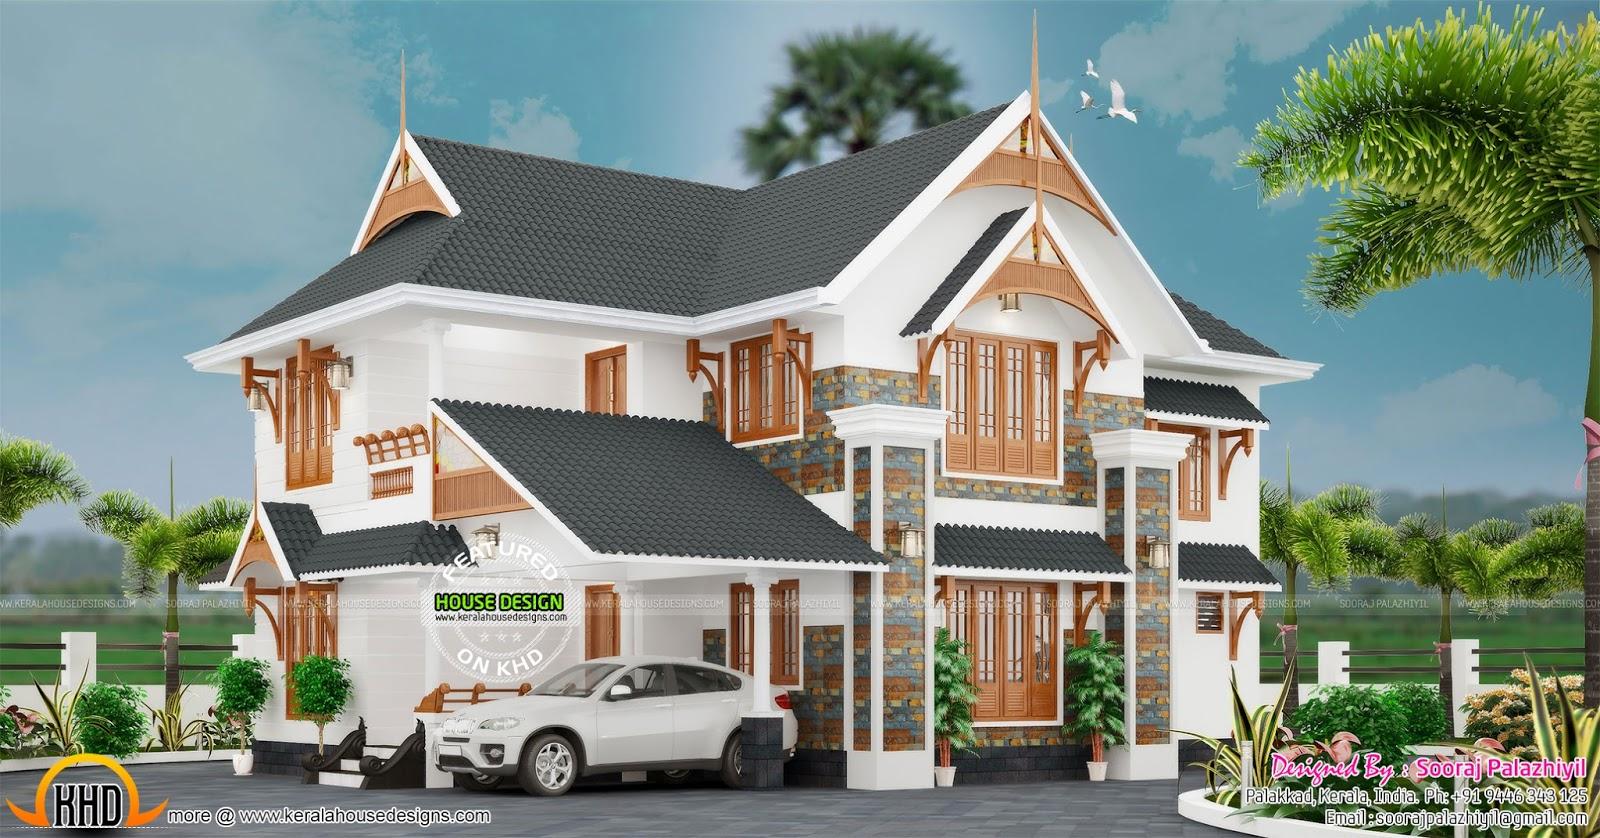 Beautiful elegant home design kerala home design and for Elegant house design